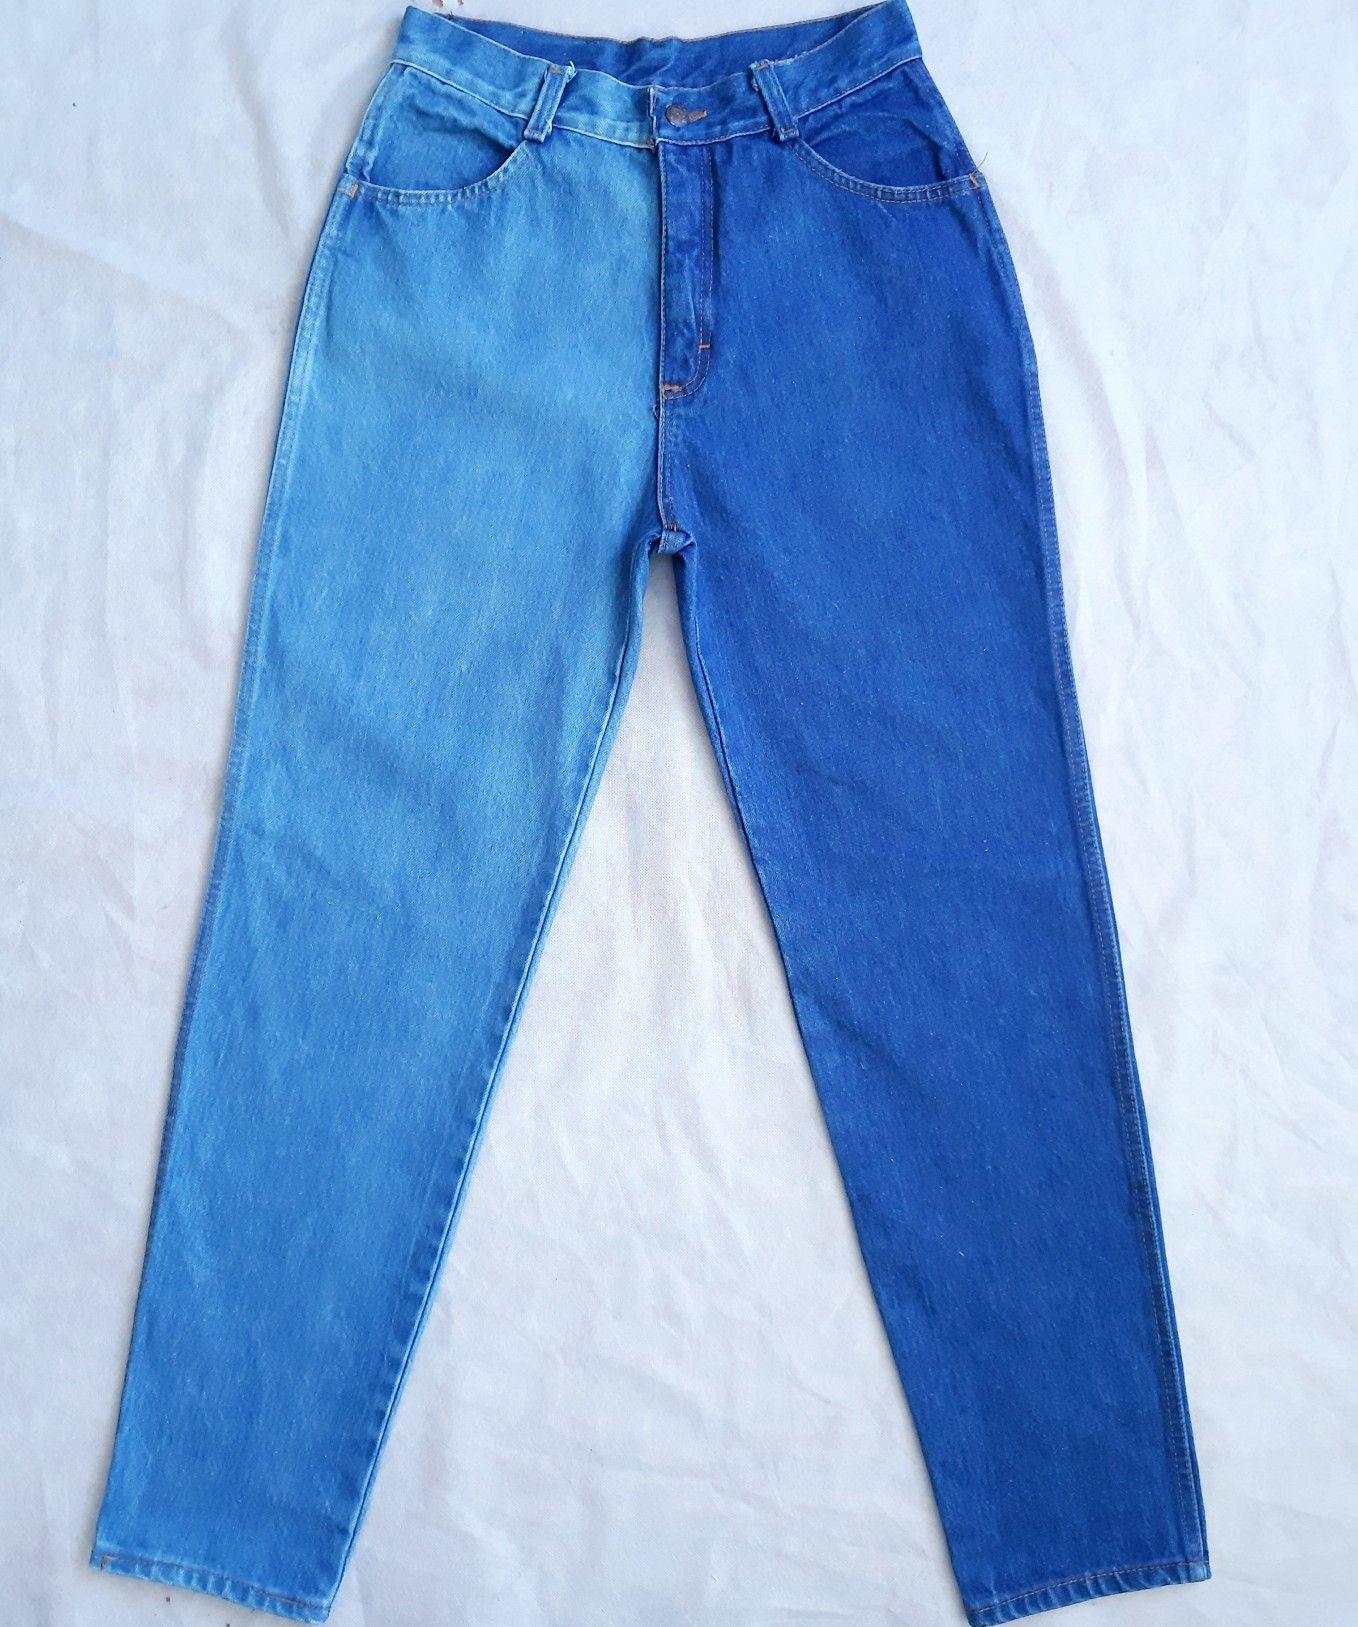 Jeans Bicolor Manualidades Ropa Ropa Pintada Ropa